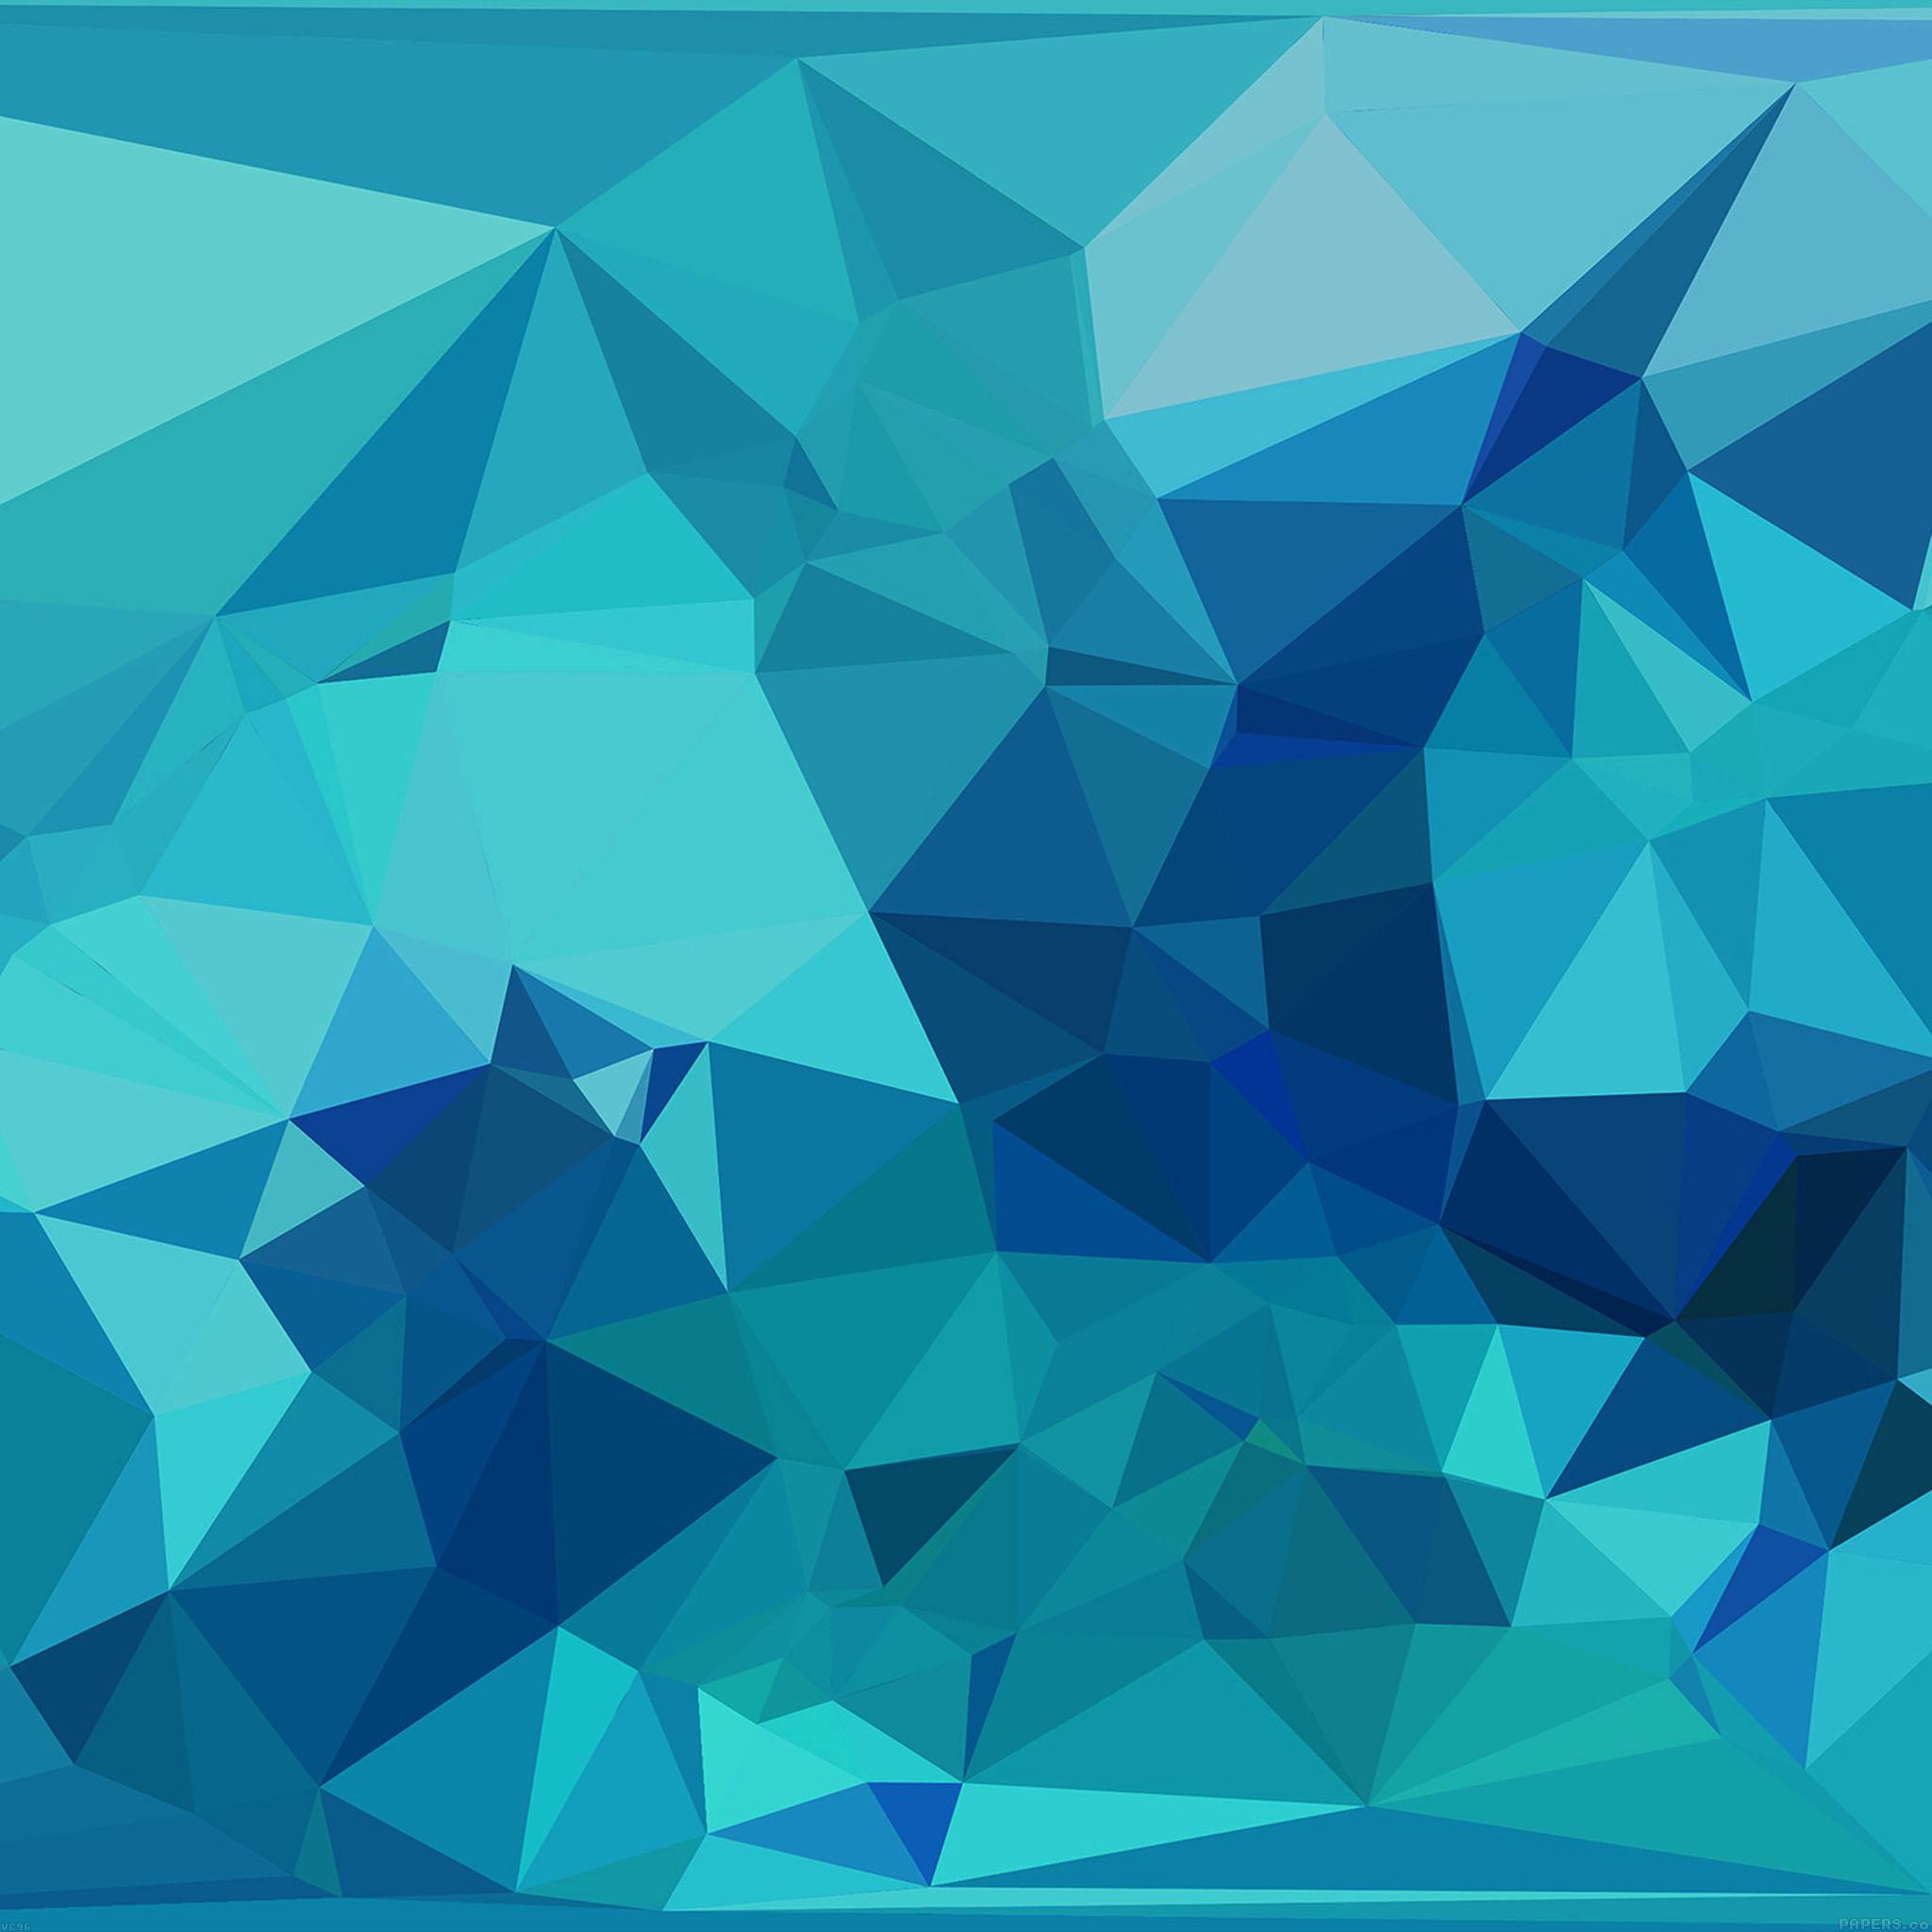 Iphone 5 Wallpaper On Tumblr